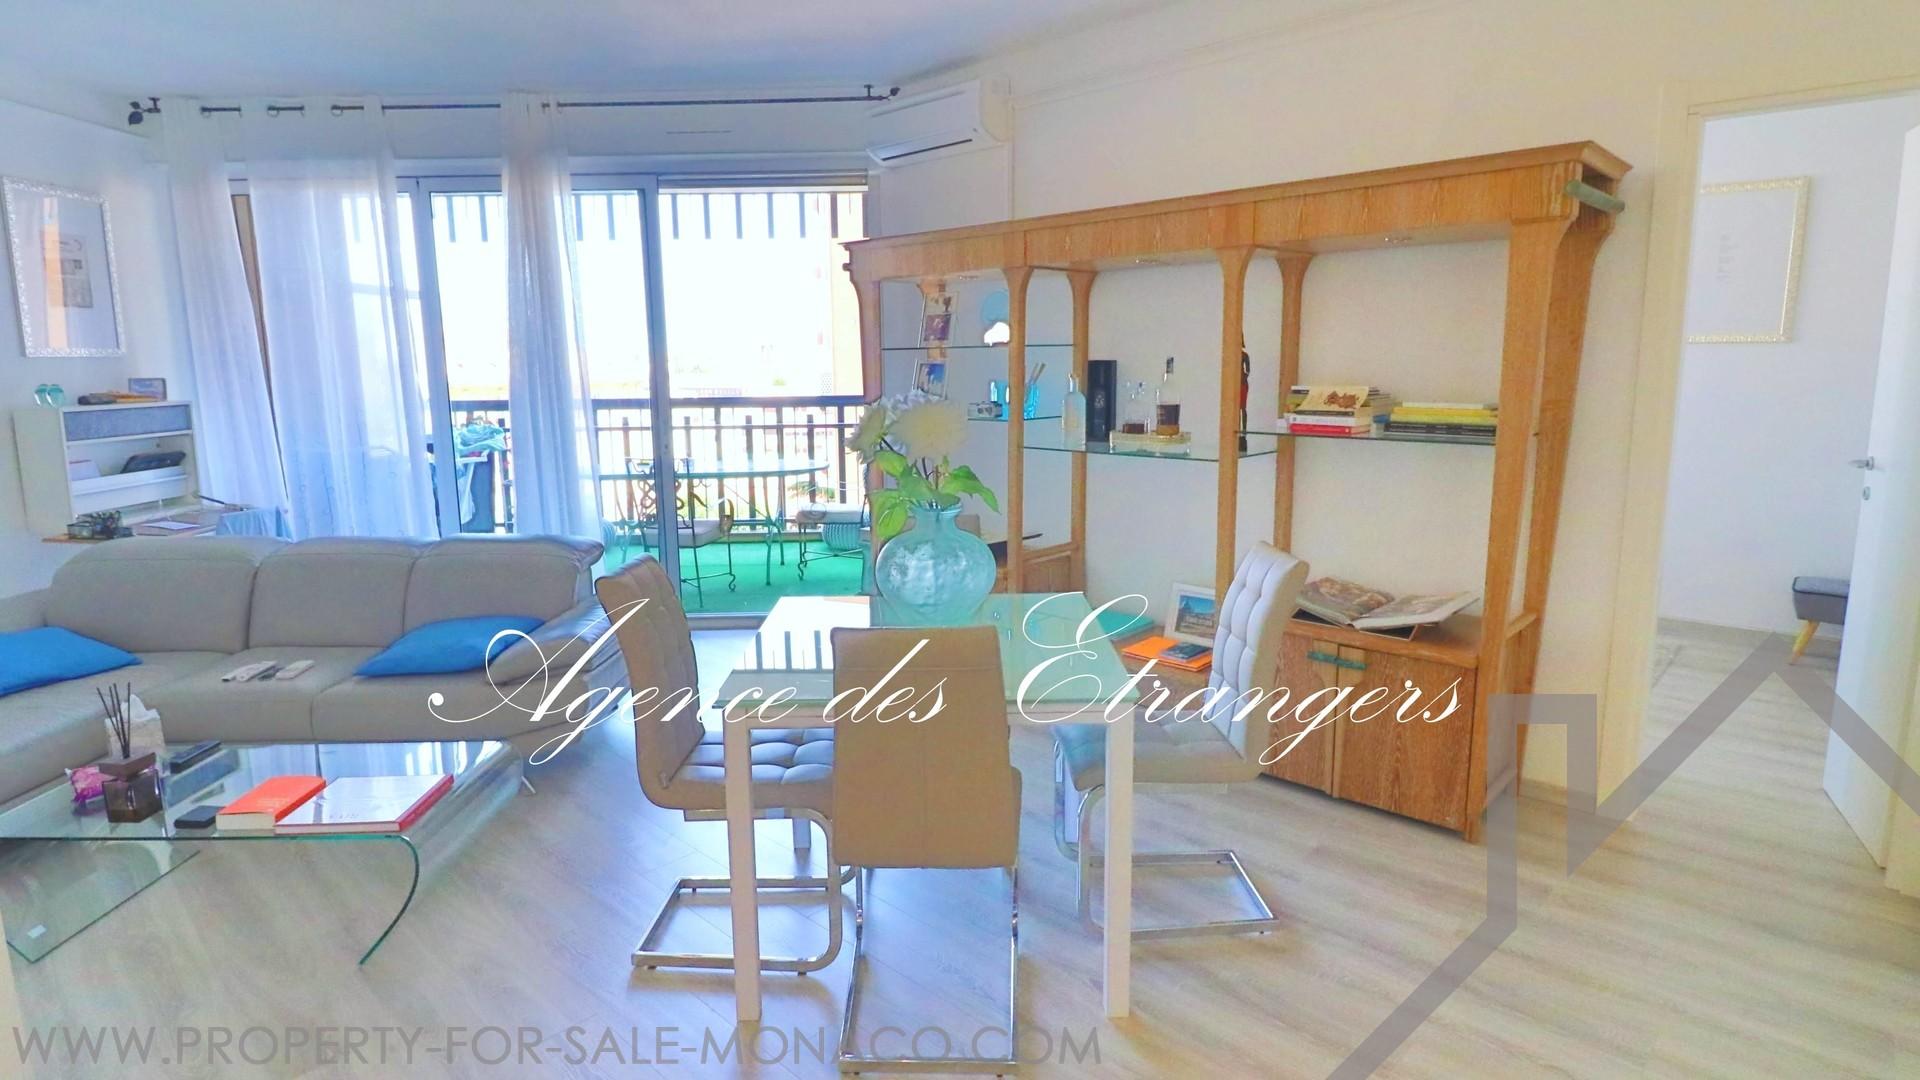 MILLEFIORI - REFURBISHED 2 ROOMS APART. - TERRACE - Properties for ...